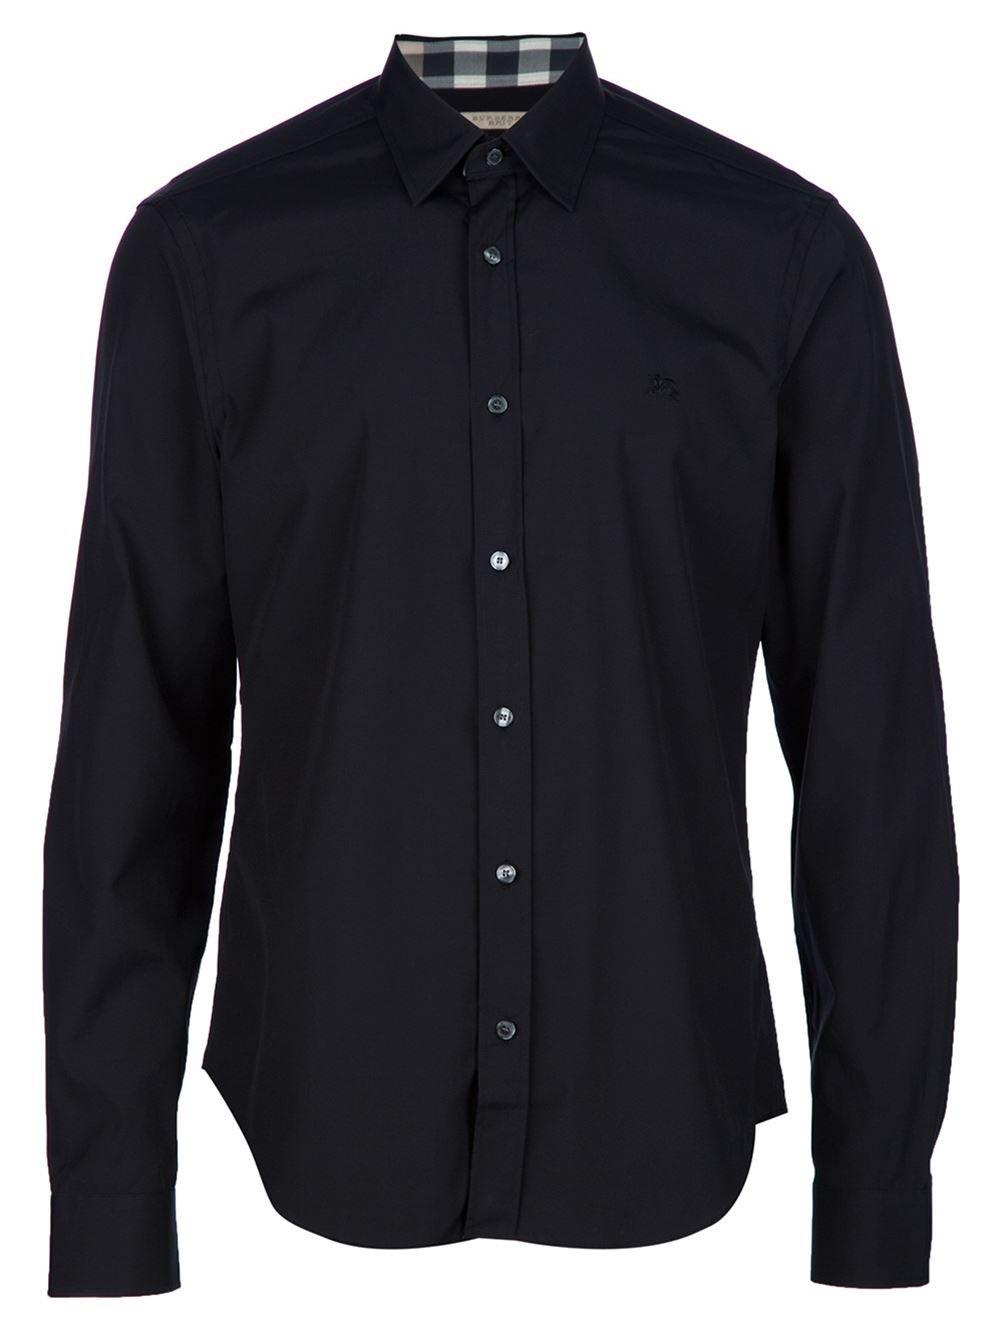 Burberry Men's Cambridge Black Stretch Cotton Trim Fit Logo Sport Casual Shirt (XL)